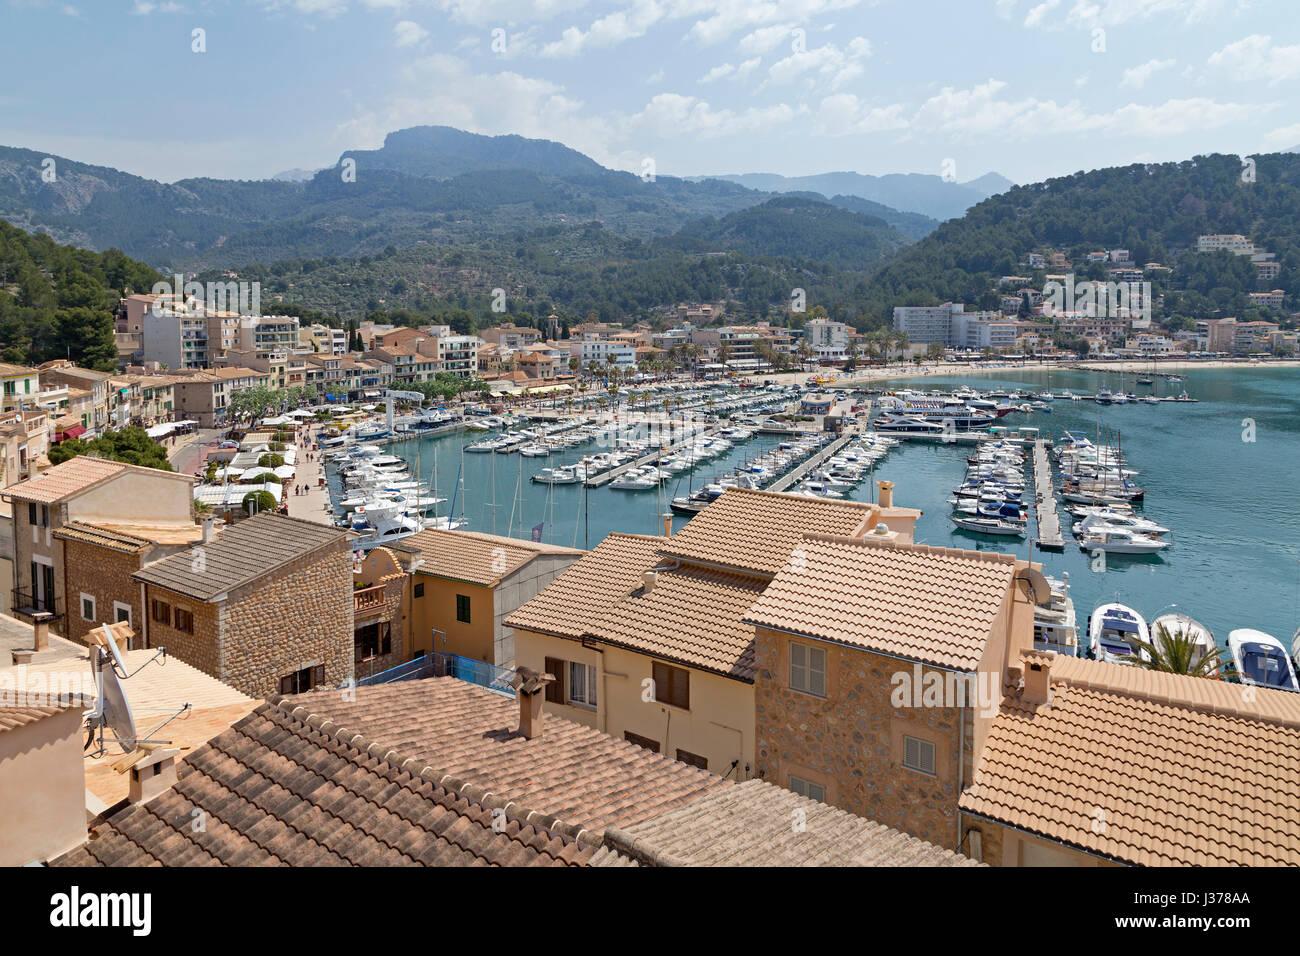 harbour of Port de Sóller, Mallorca, Spain Stock Photo